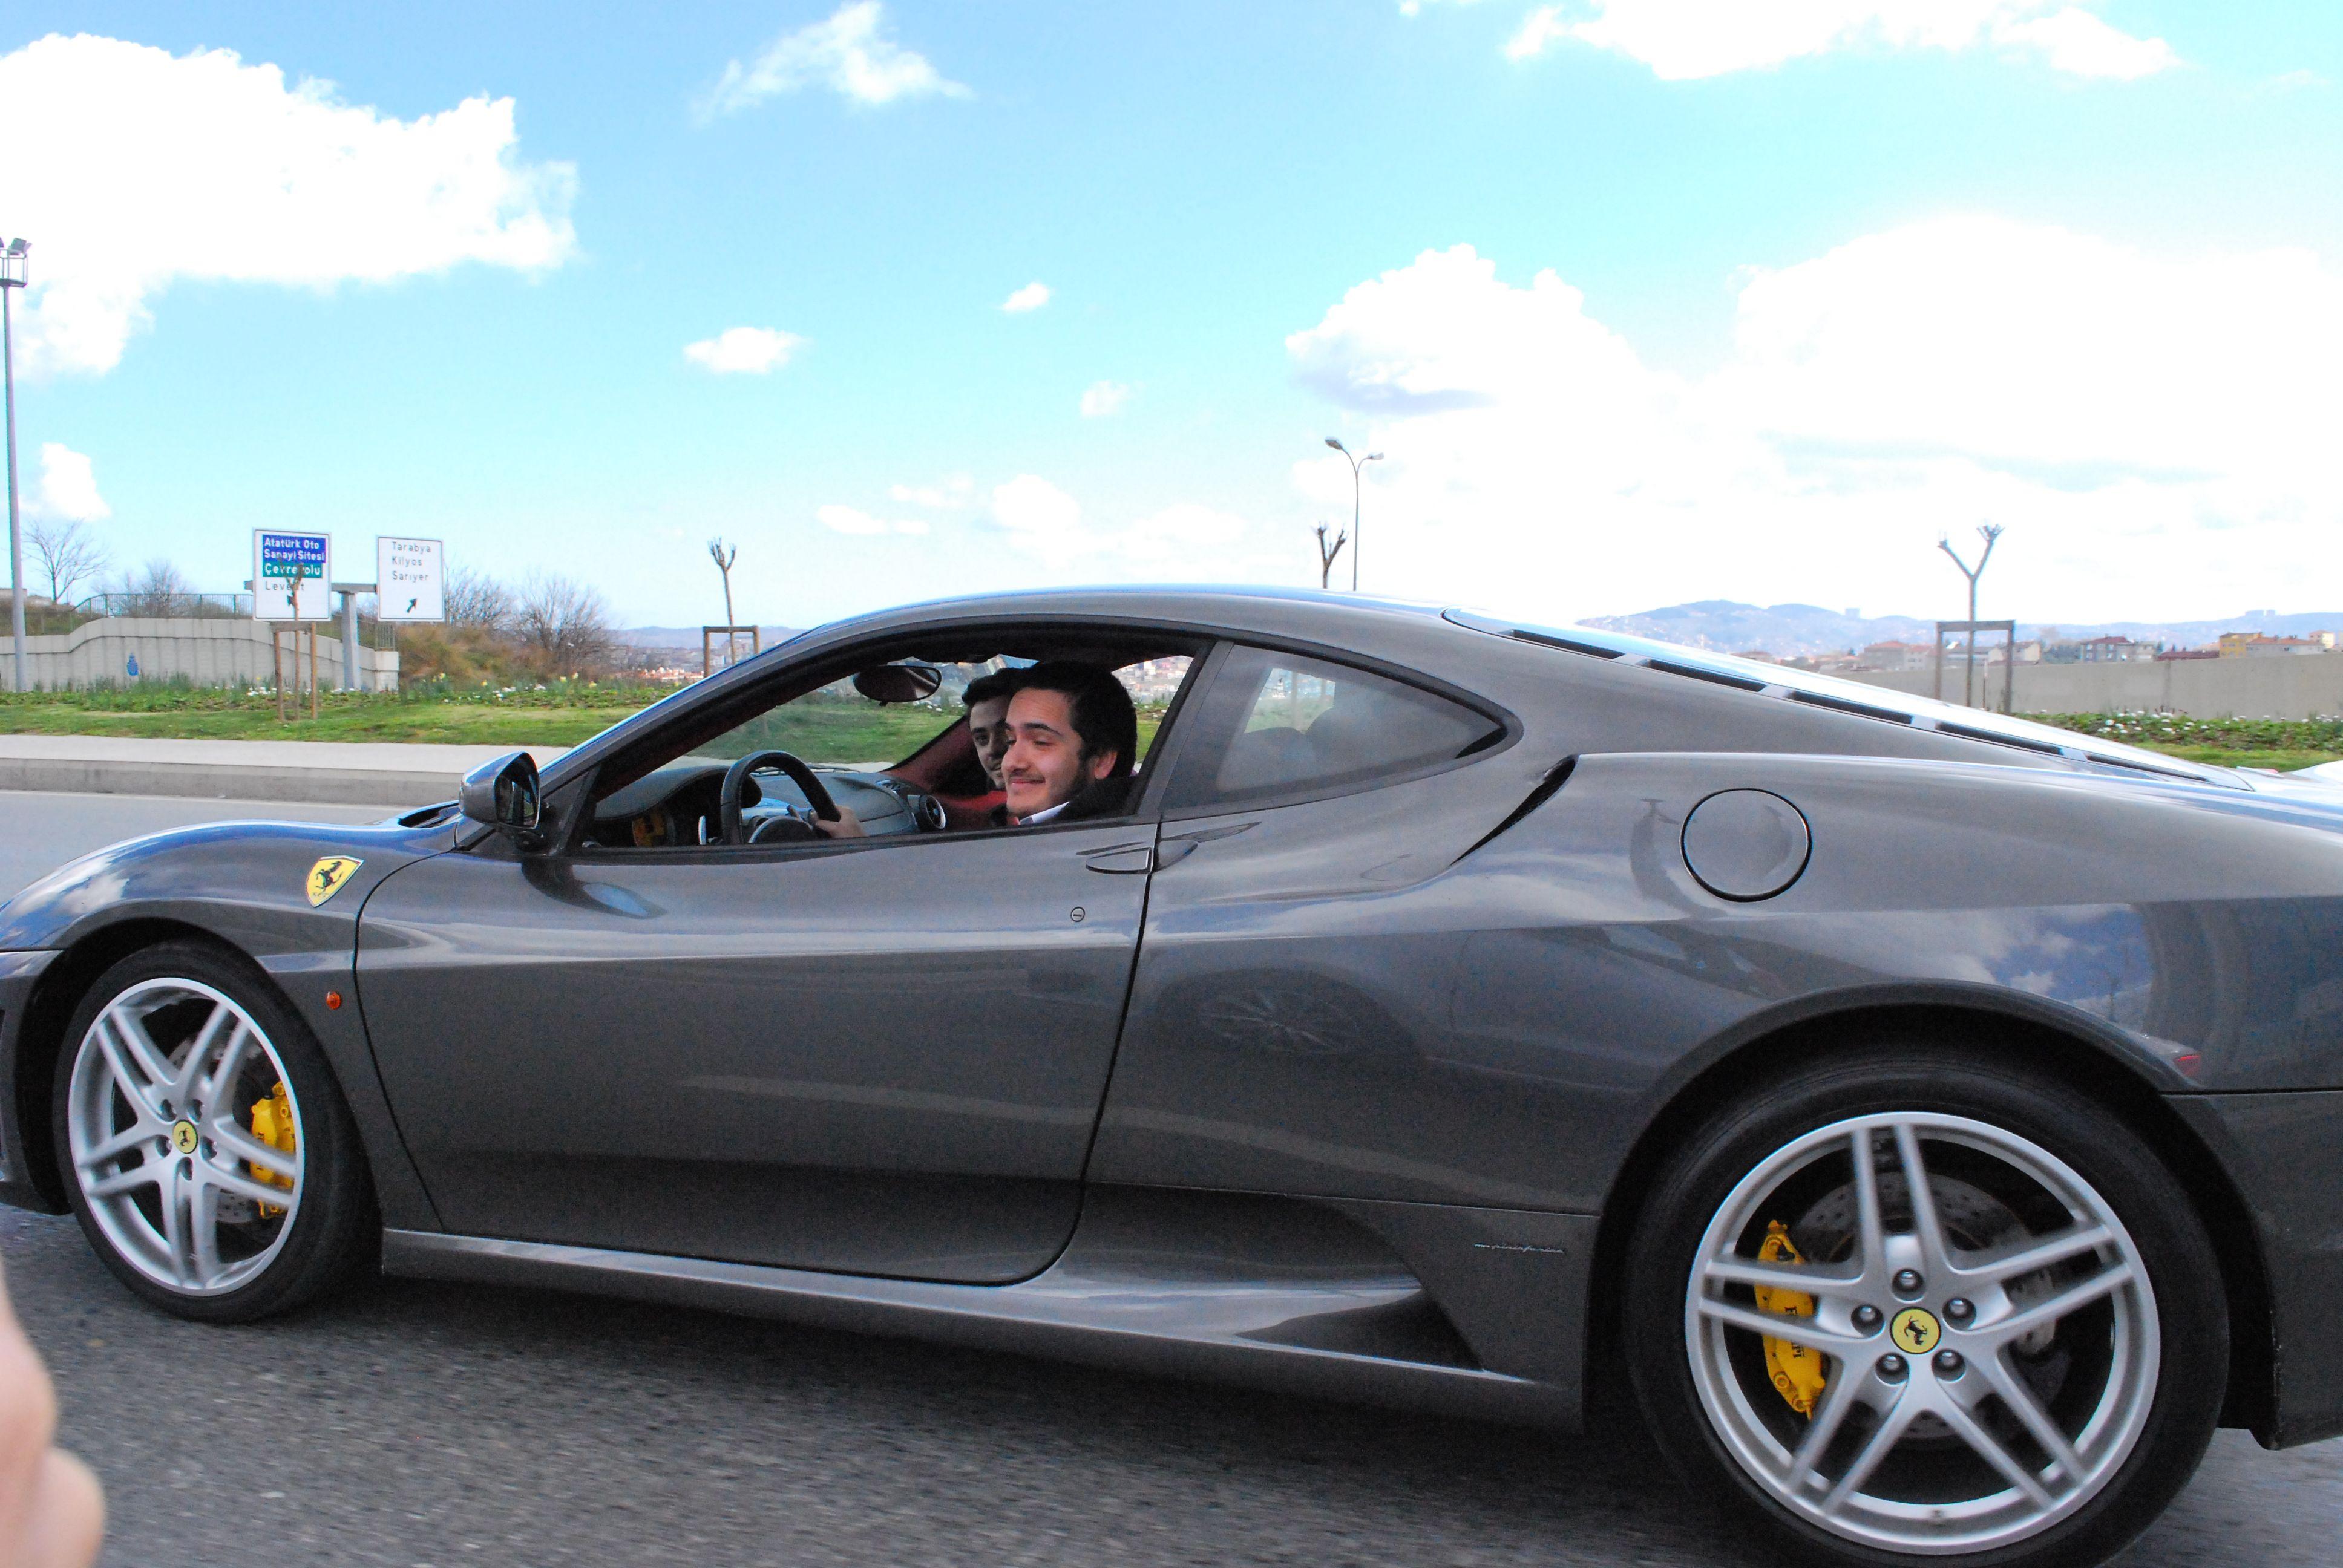 Ferrari f430 silverstone 570hp tubi exhaust fotoraf mehmet ferrari f430 silverstone 570hp tubi exhaust fotoraf mehmet sabri sepik vanachro Images